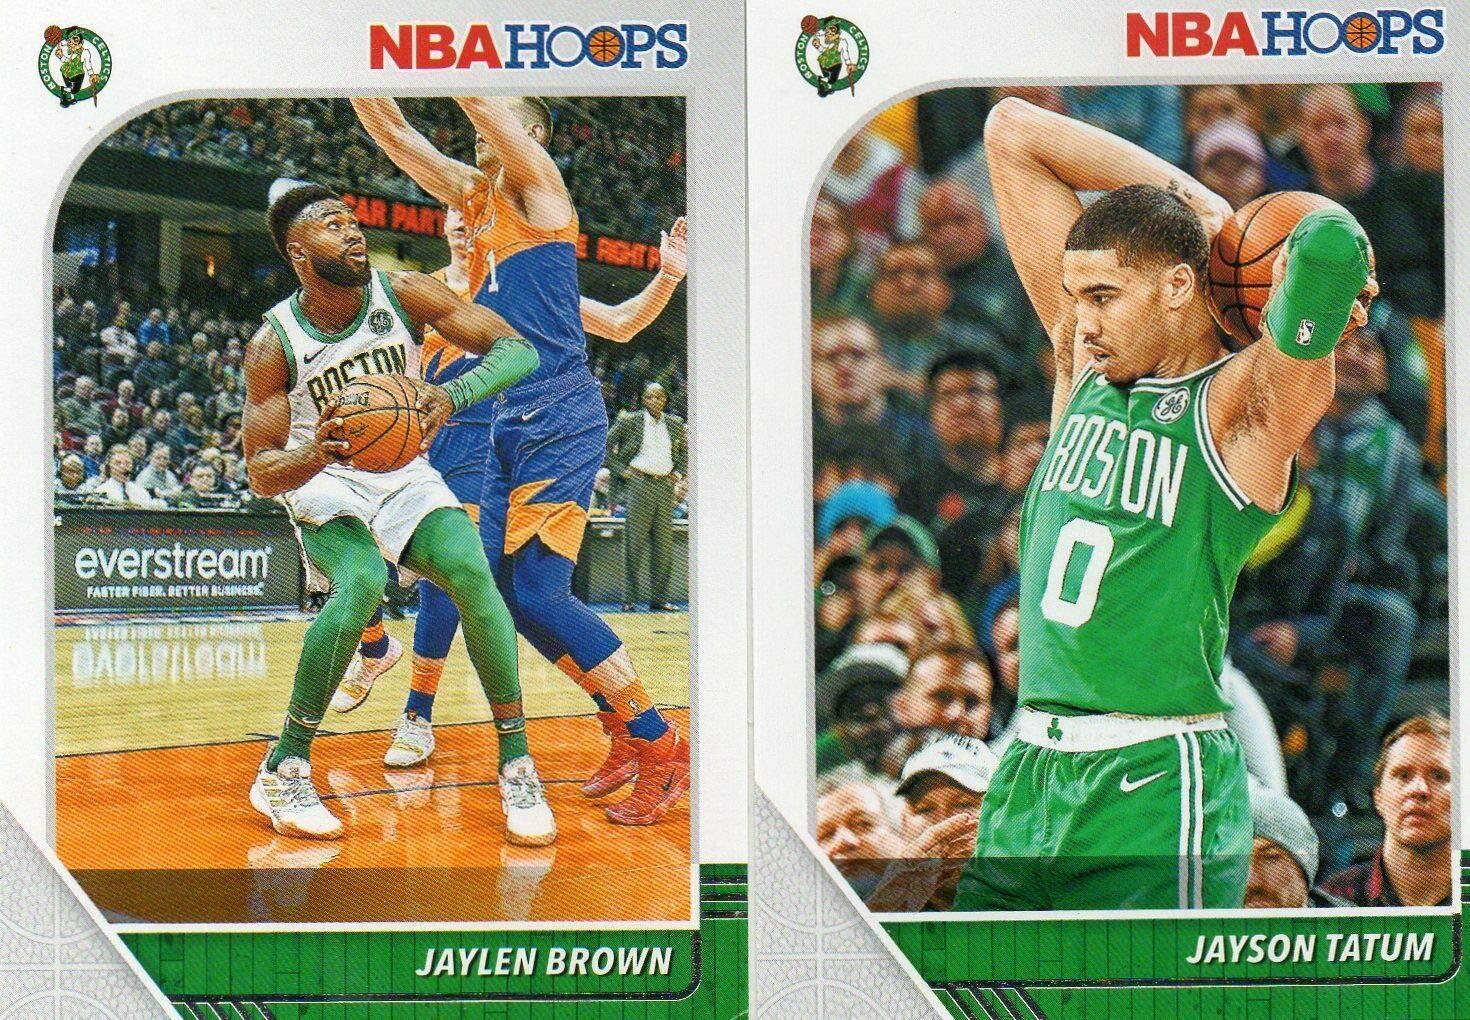 Gordon Hayward and Jayson Tatum Plus Boston Celtics 2019 2020 Hoops Basketball Factory Sealed 10 Card Team Set with Kemba Walker